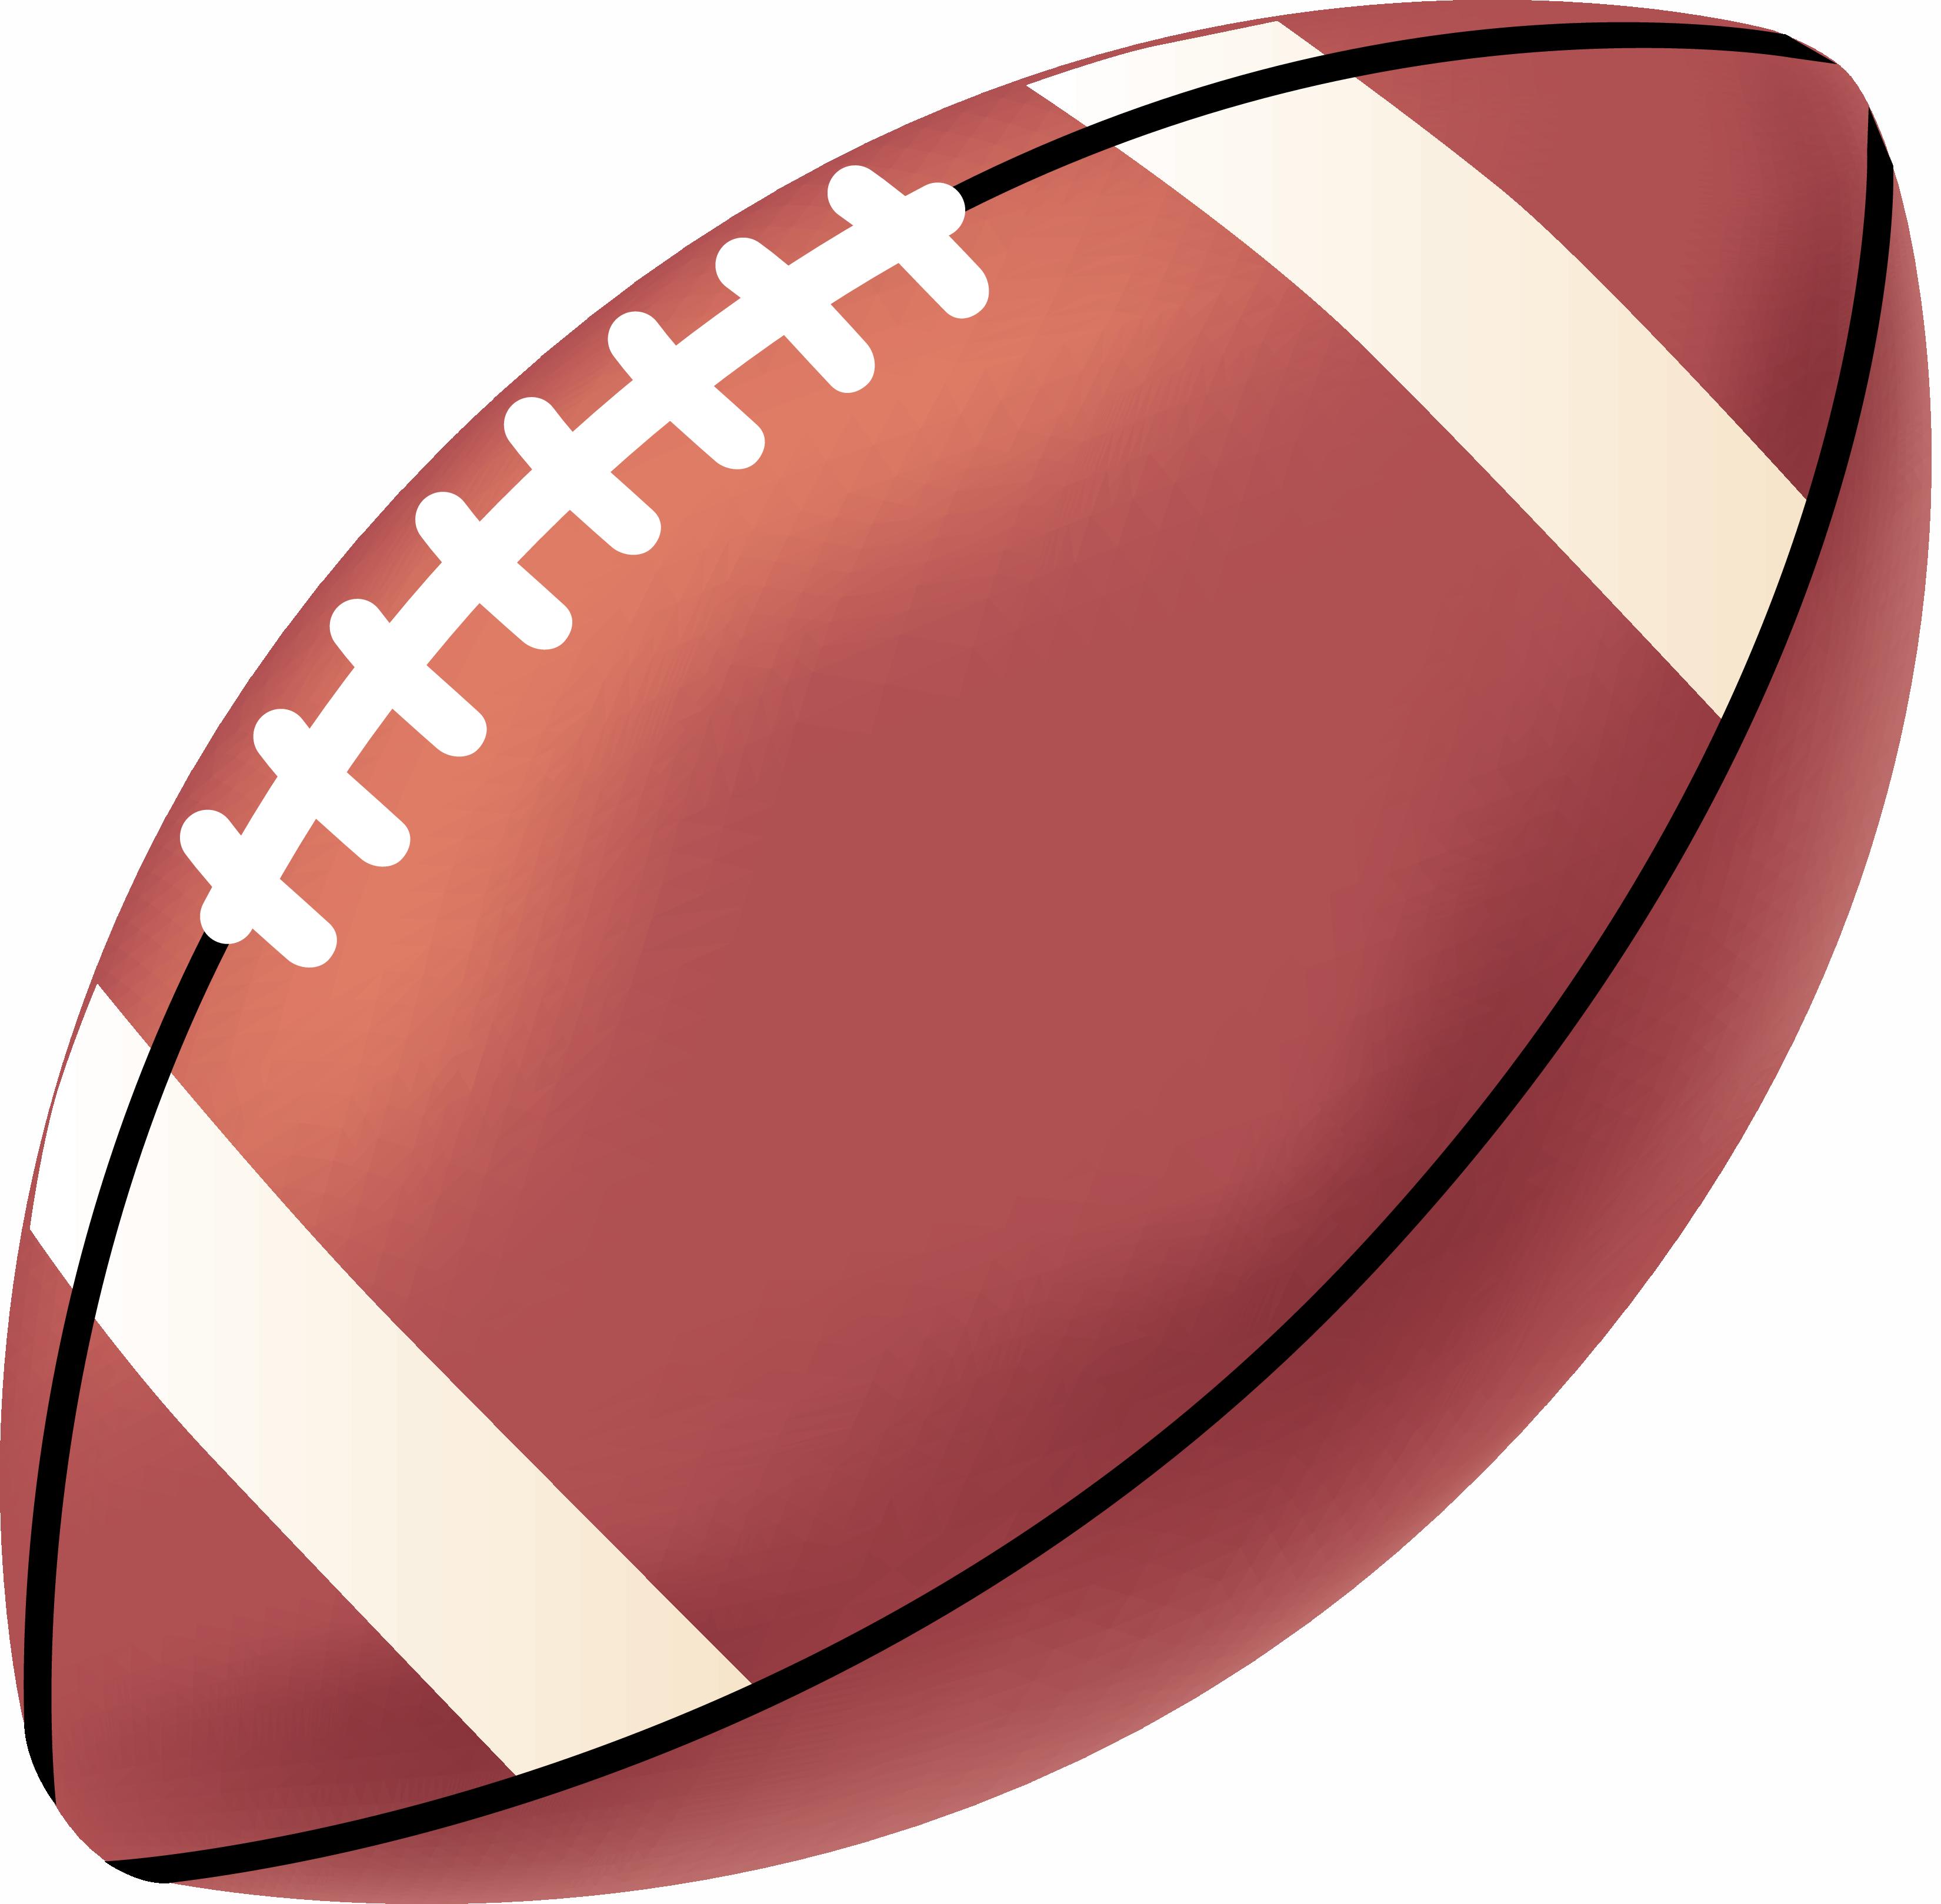 footballs clipart   clipart best